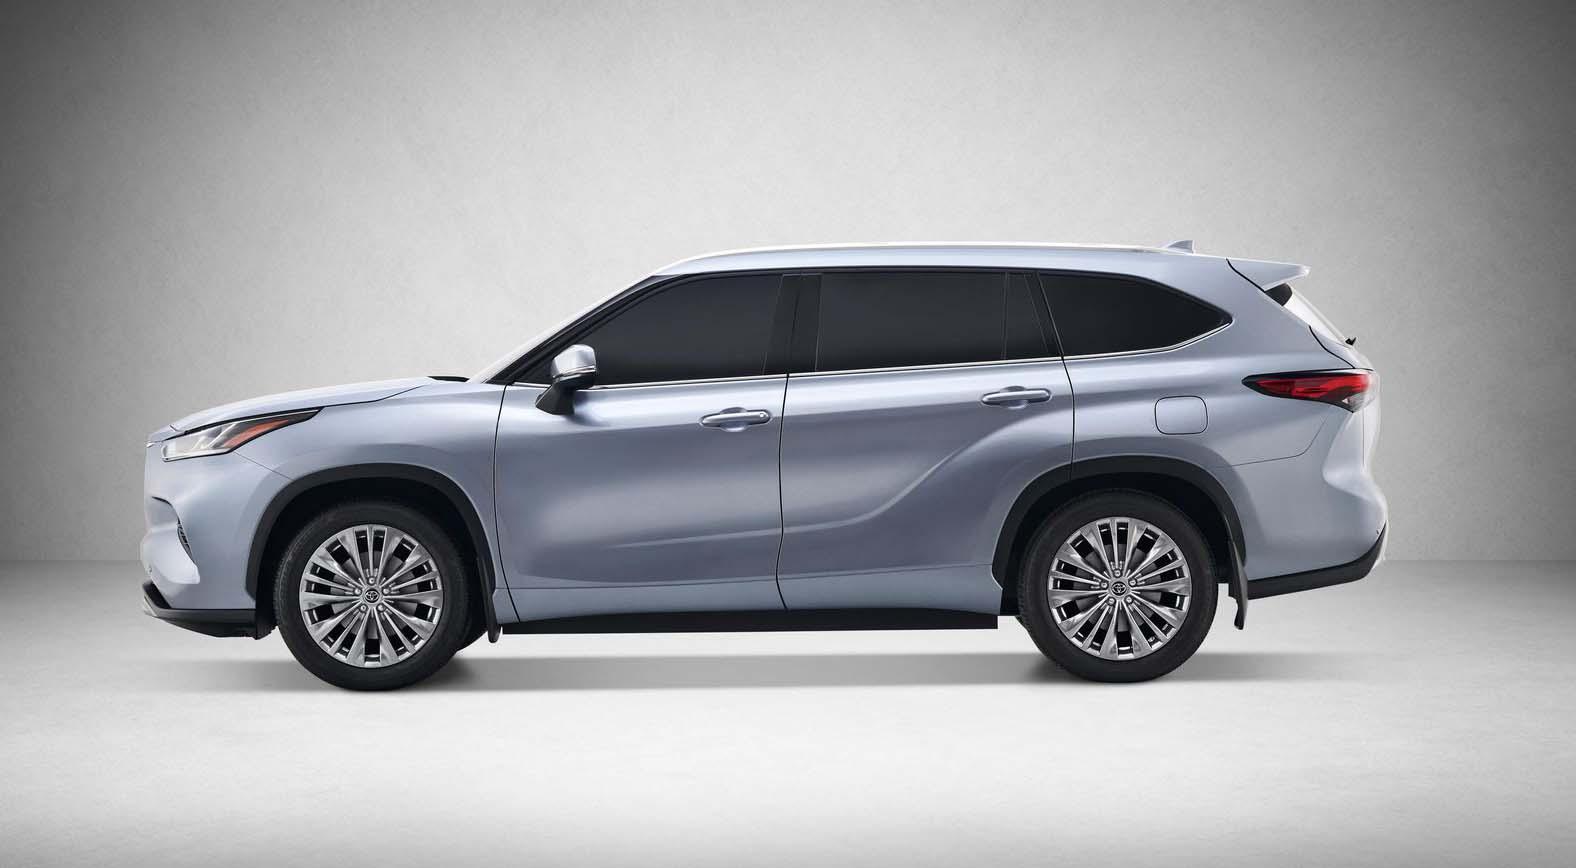 La Toyota Highlander 2020 se reinventó